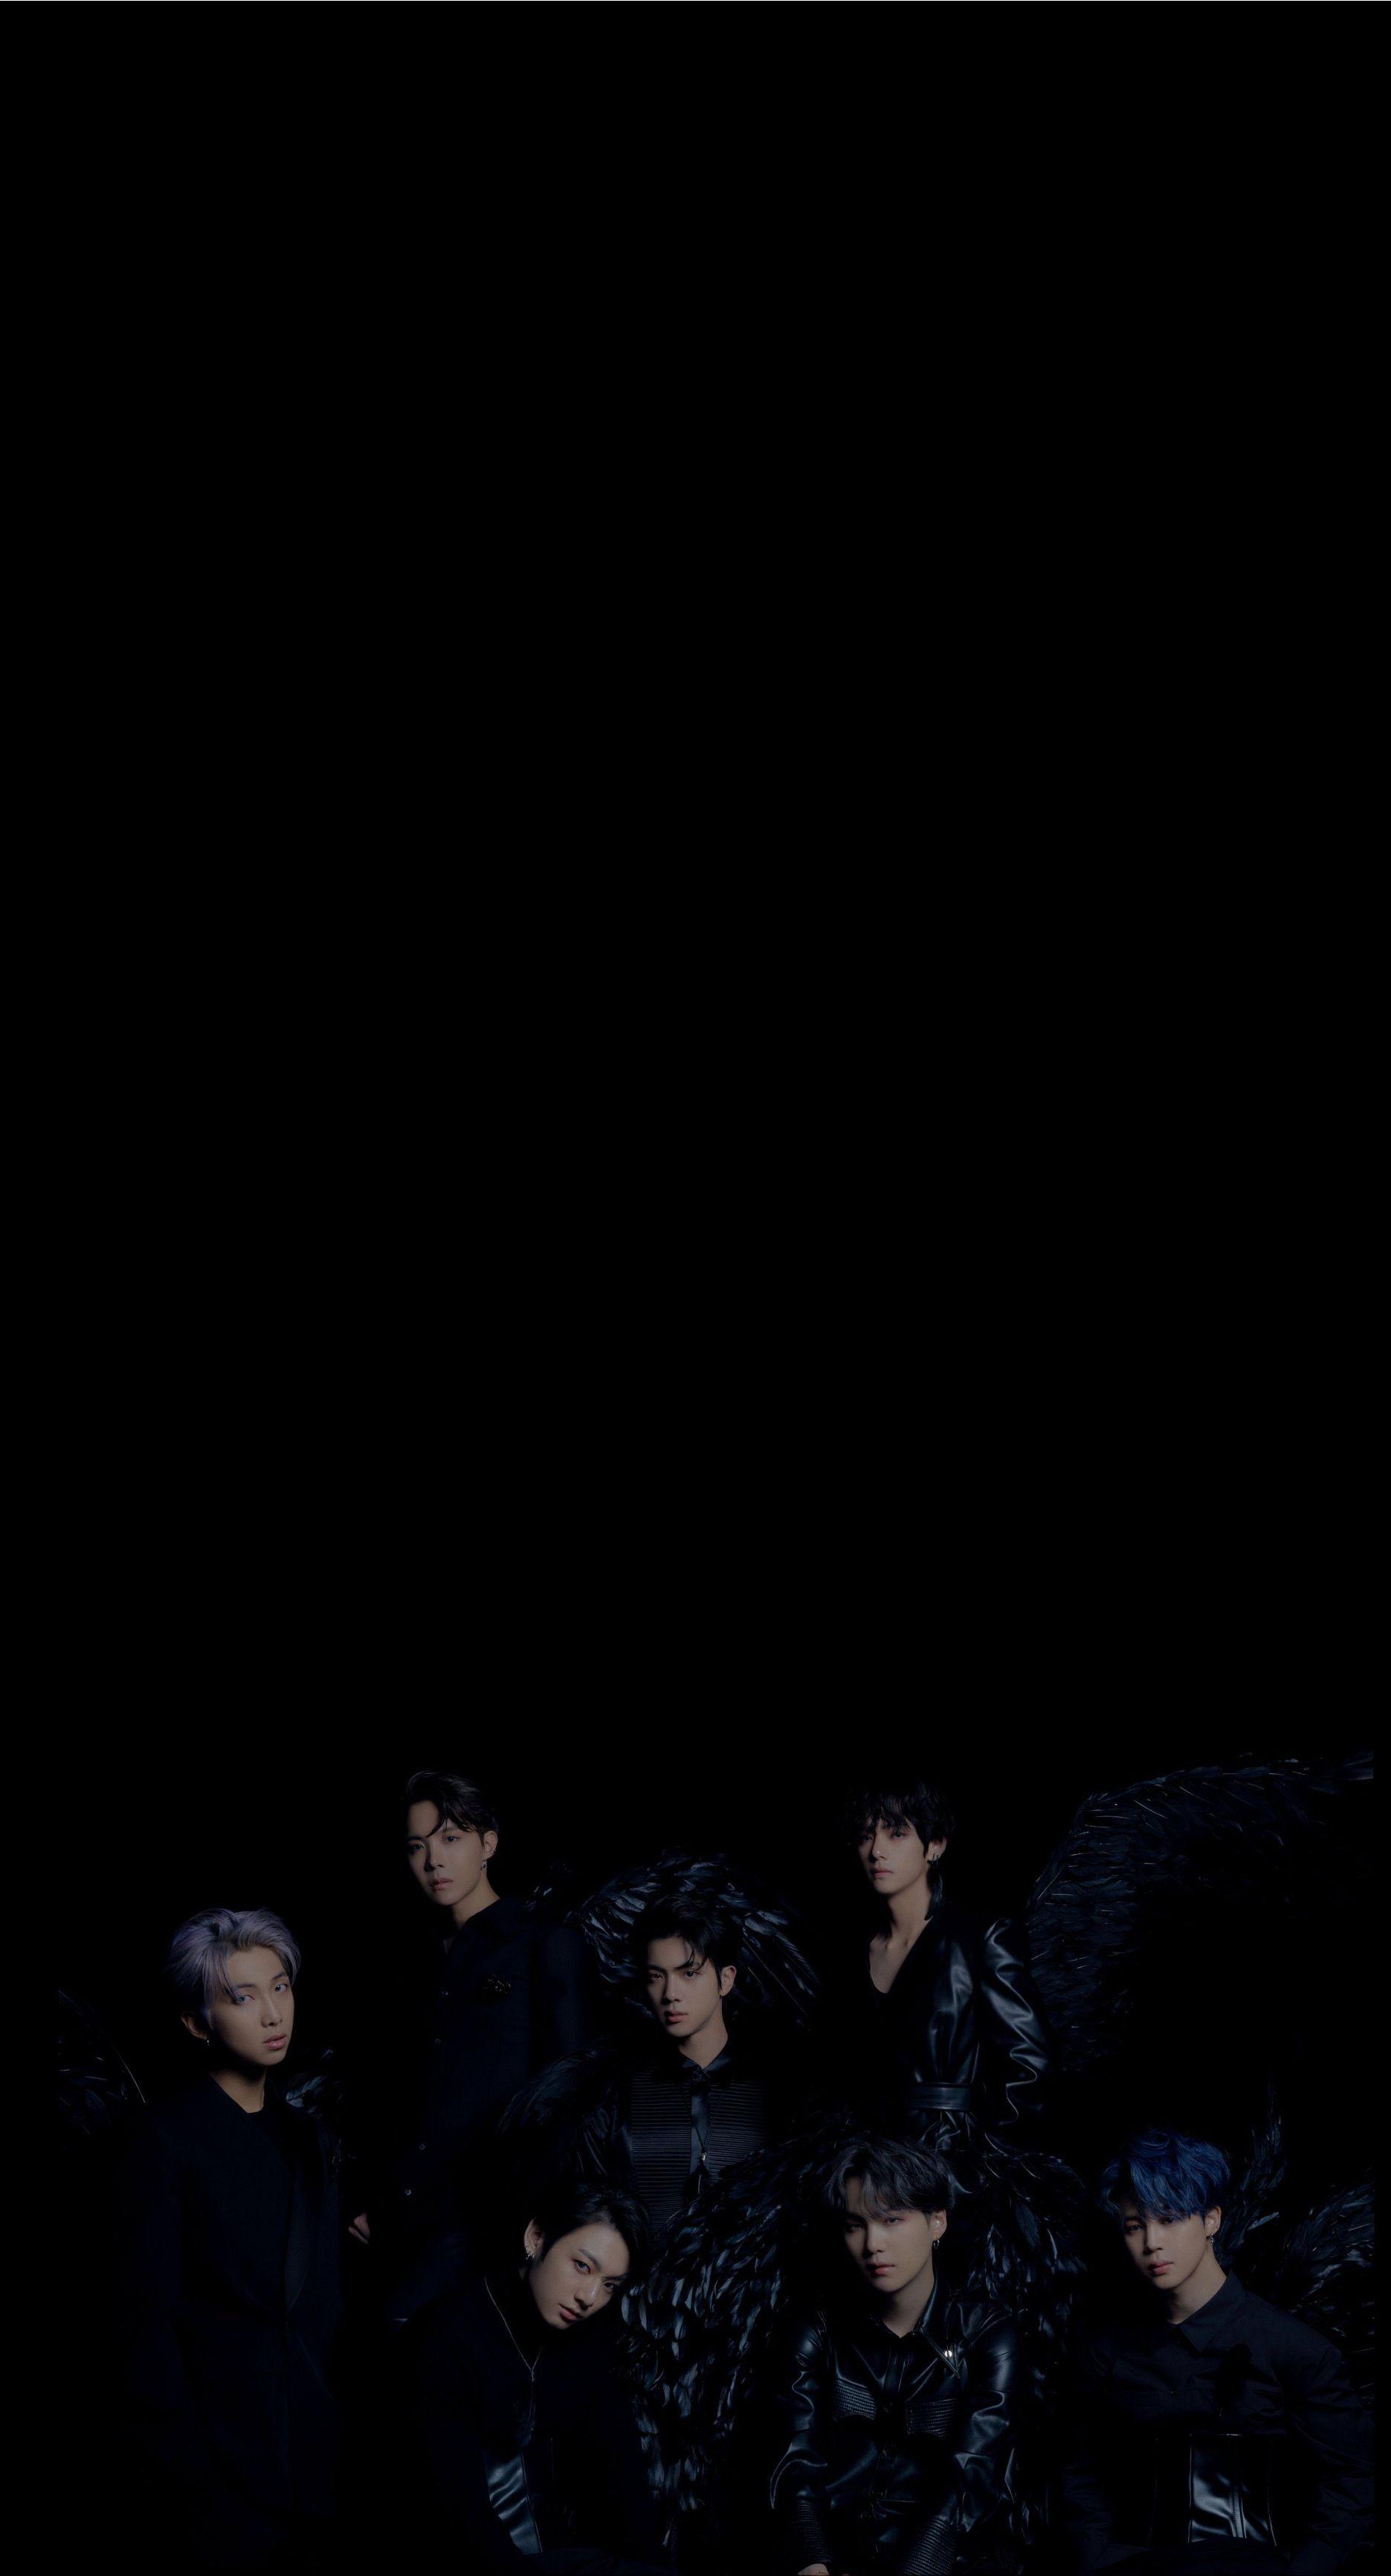 Bts Black Swan Bts Wallpaper Bts Lockscreen Bts Concept Photo Bts wallpaper with black background